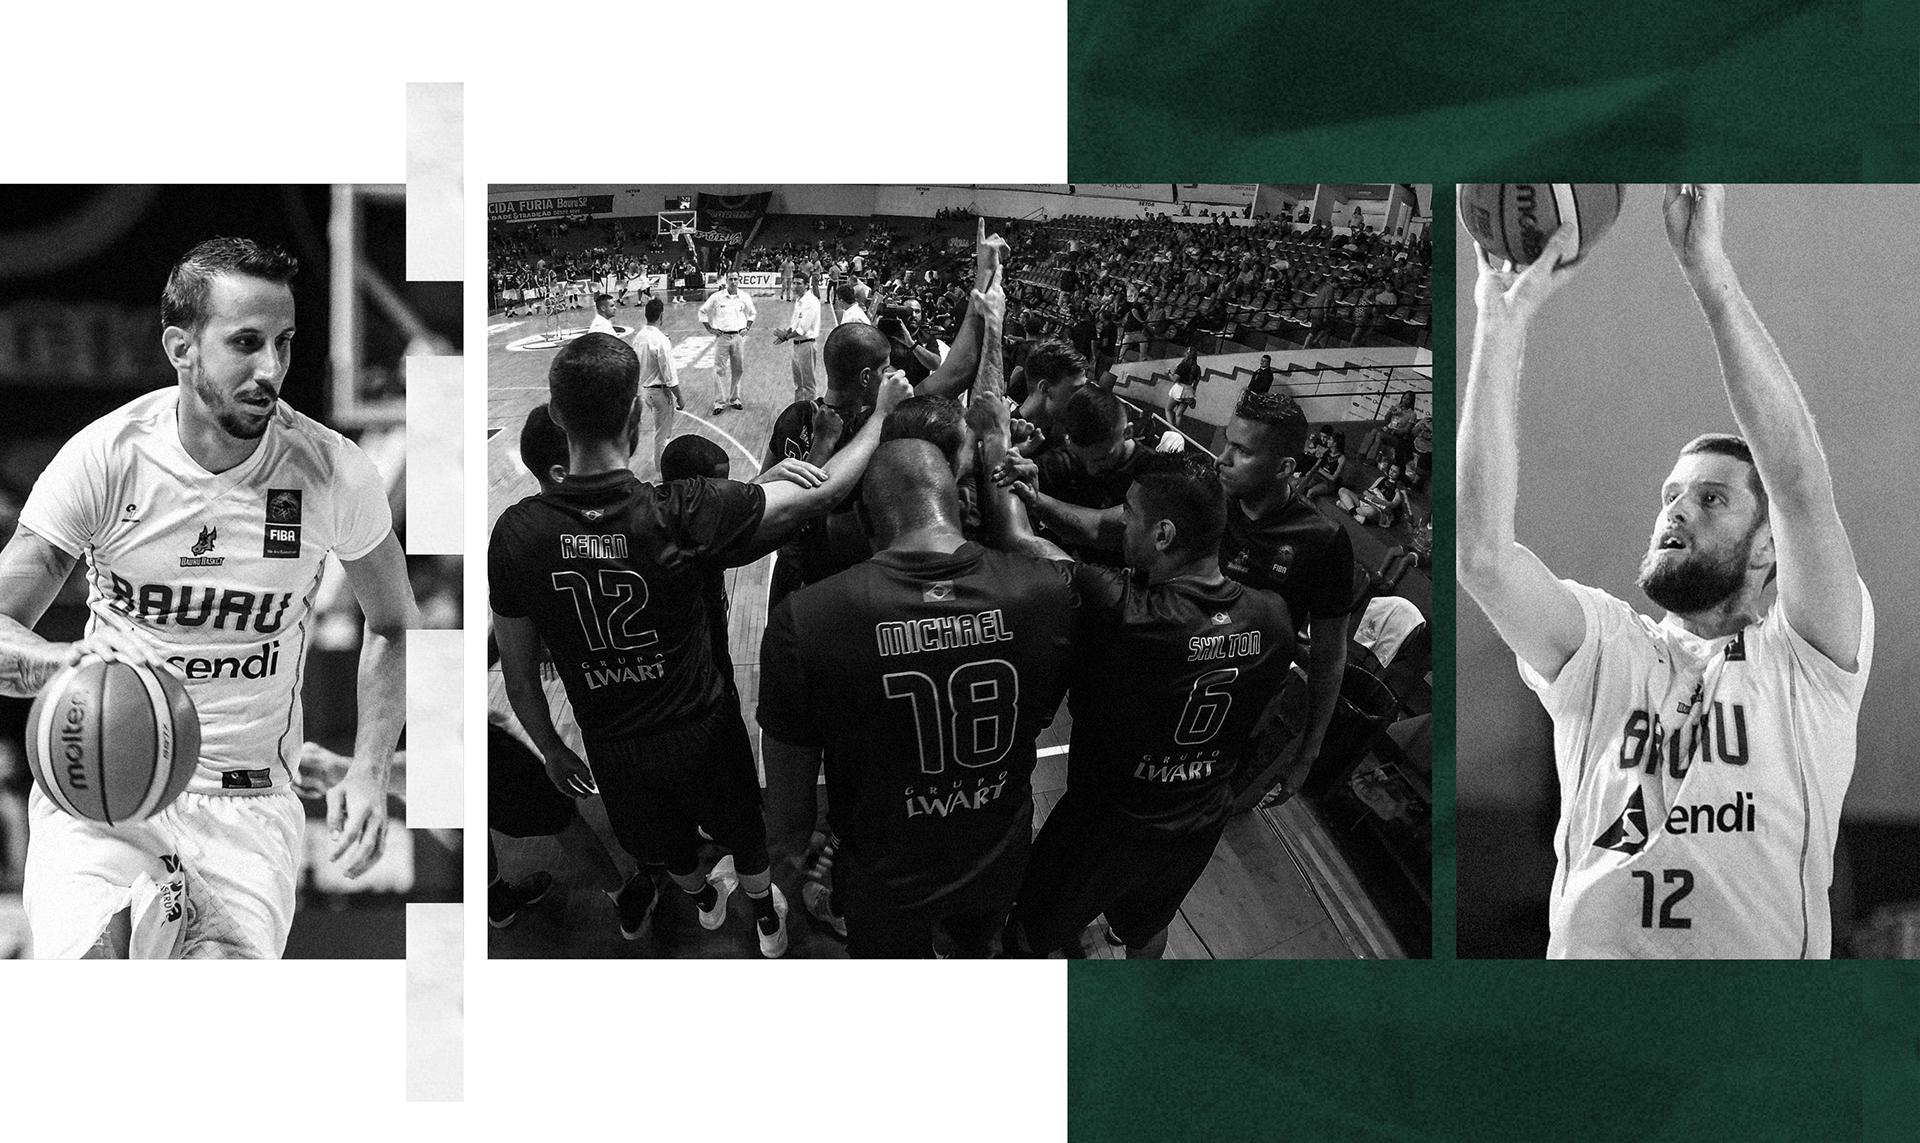 Bauru-Basket-Nacione-Branding-1